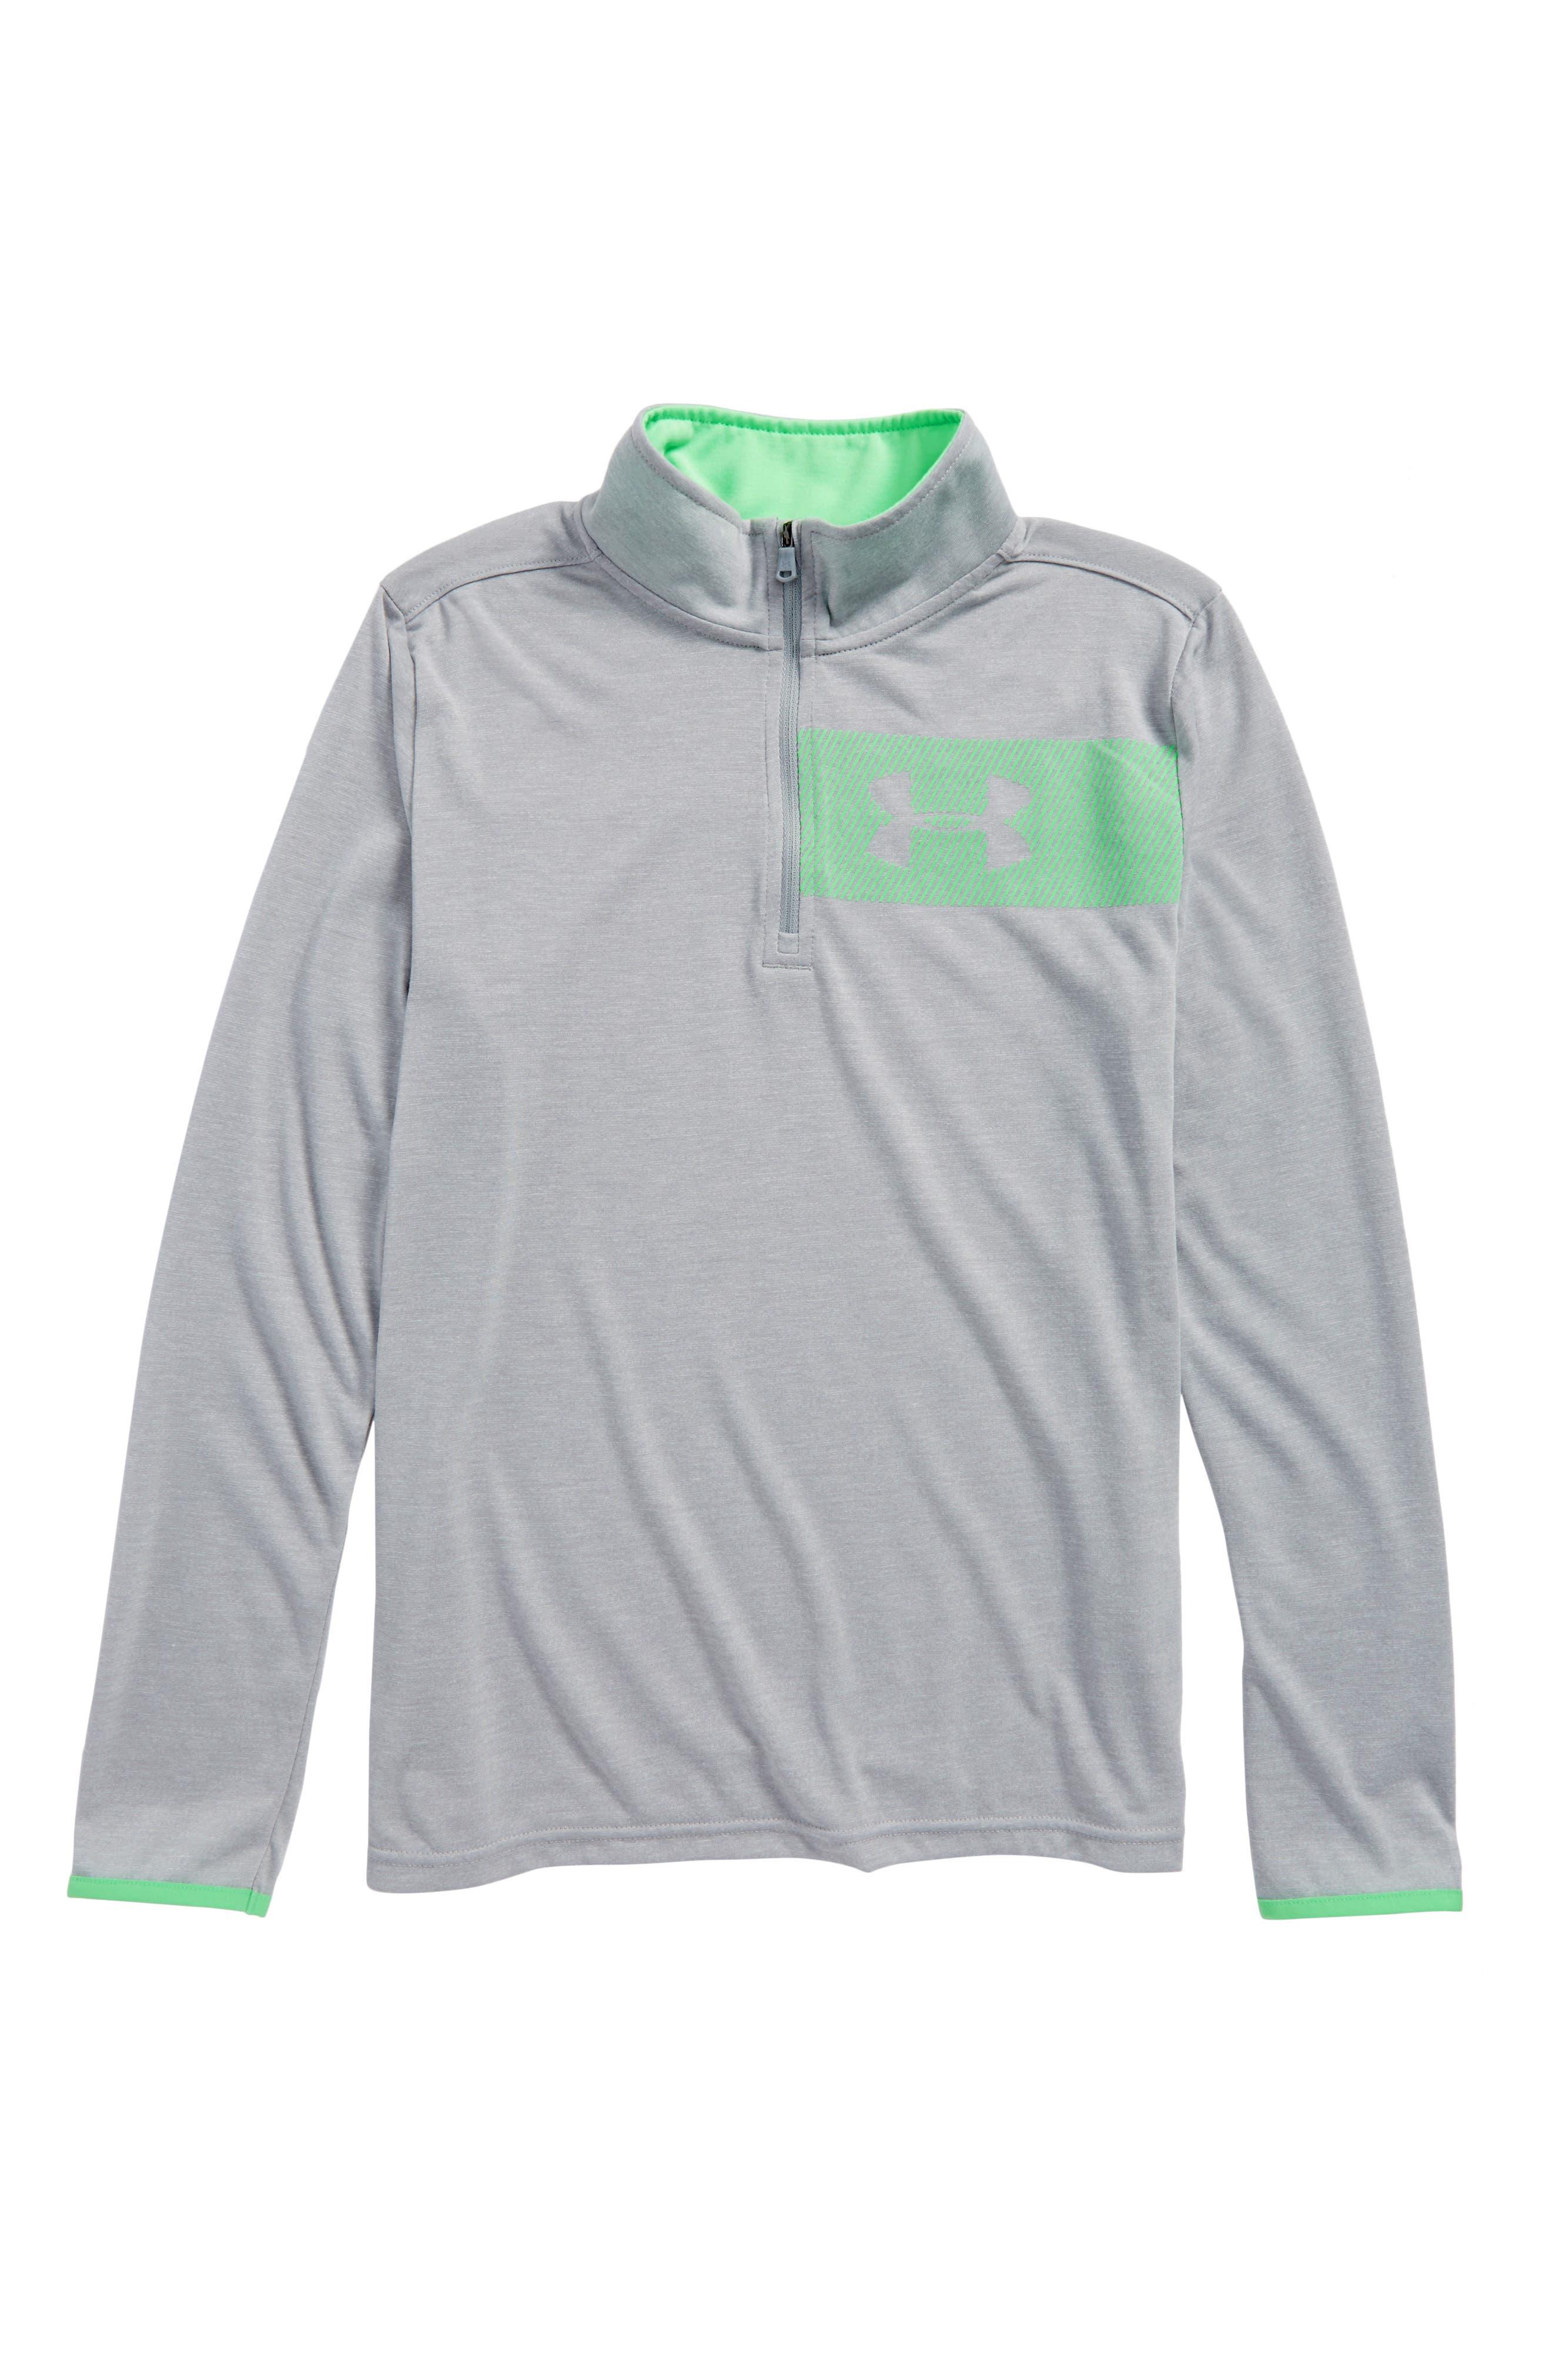 Threadborne HeatGear<sup>®</sup> Quarter Zip Pullover,                         Main,                         color, Overcast Gray Light Heather